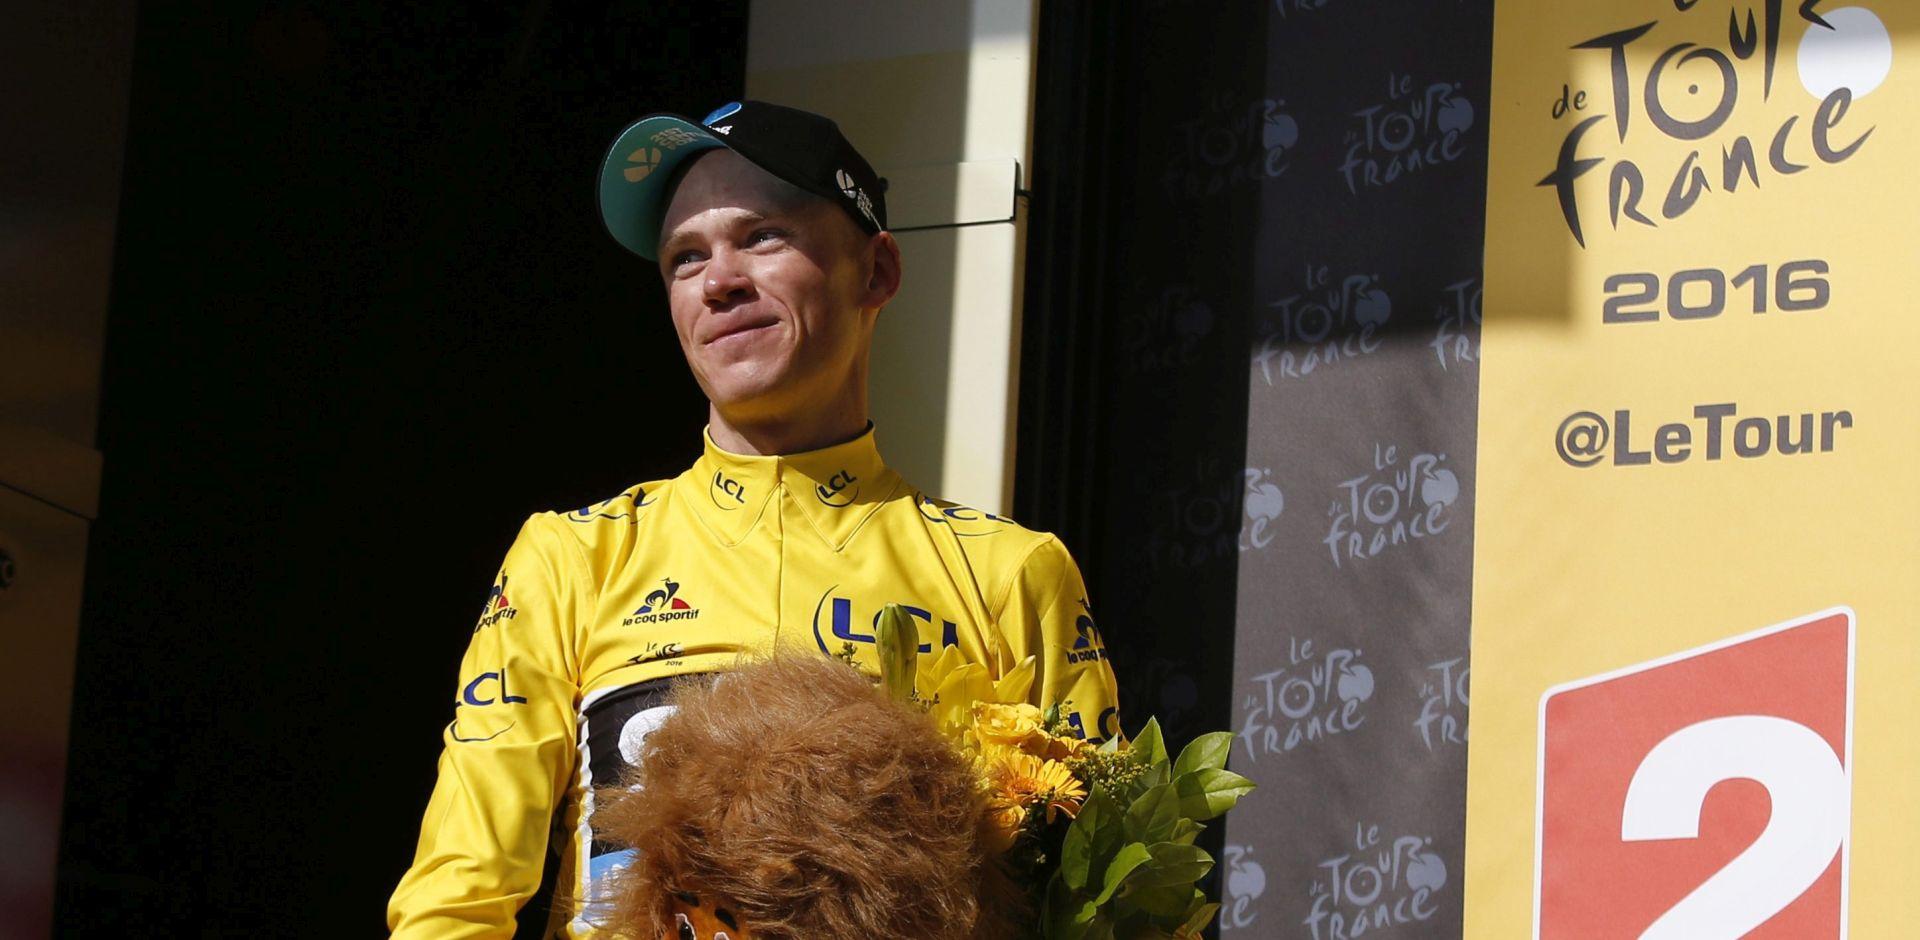 TOUR DE FRANCE Froome etapnom pobjedom učvrstio vodstvo